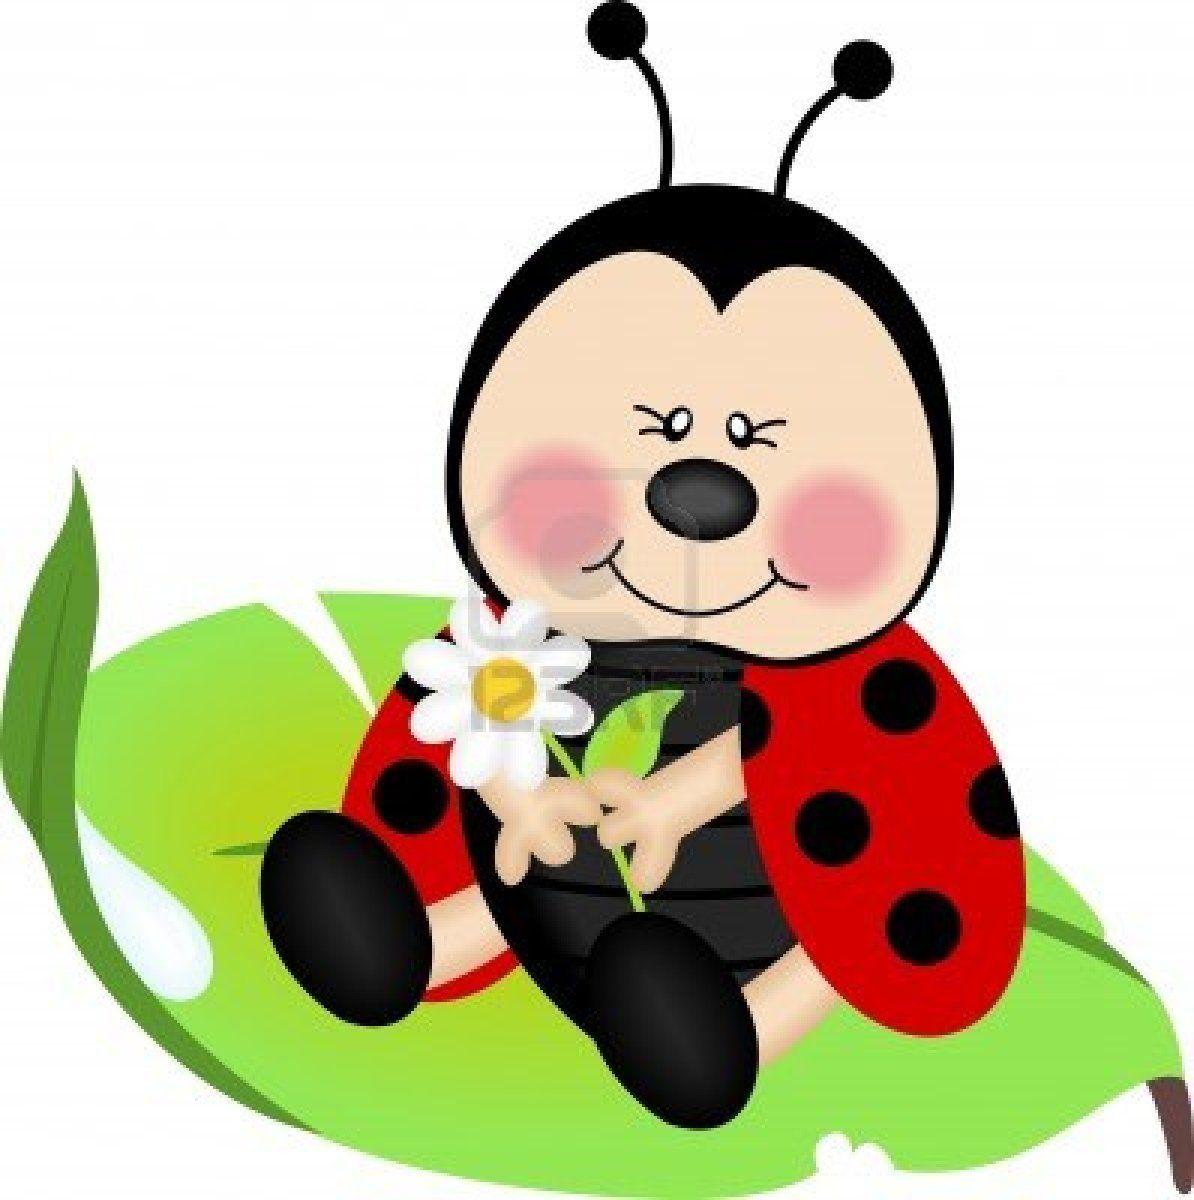 Ladybug Ladybug Cartoon Ladybug Ladybug Art